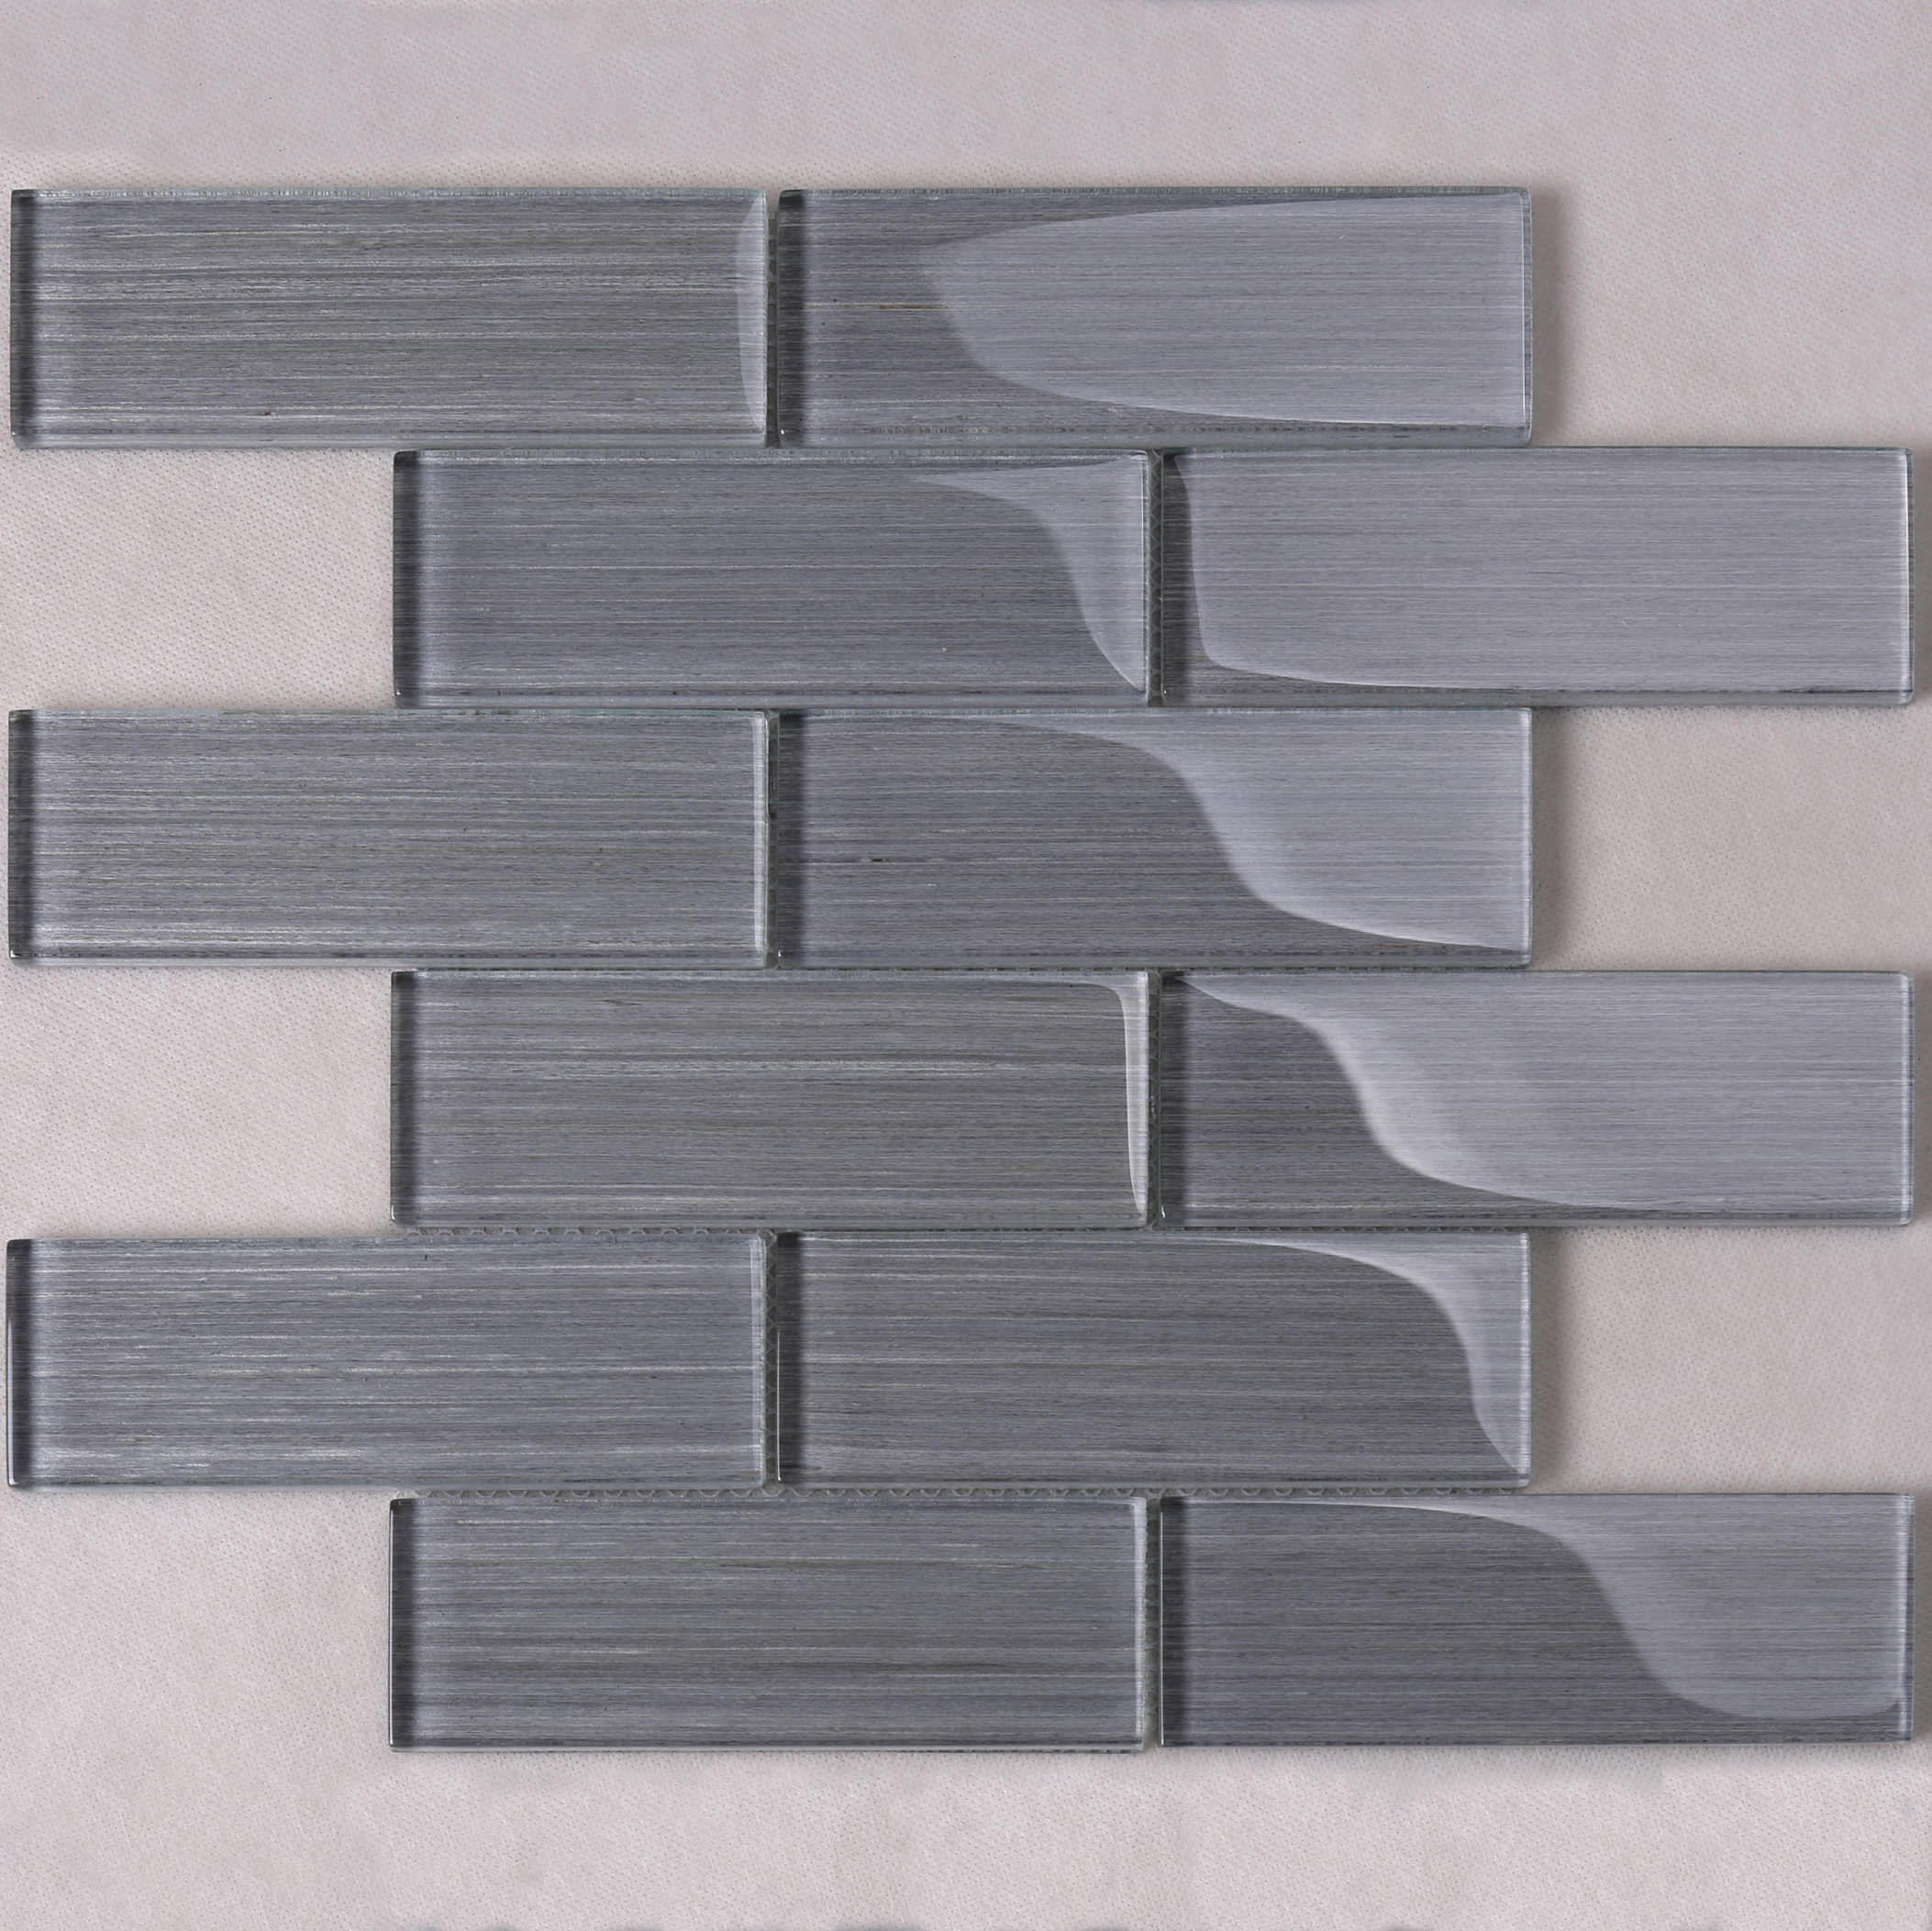 Heng Xing-Glass Wall Tiles, White Glass Backsplash Manufacturer   Glass Mosaic Tile